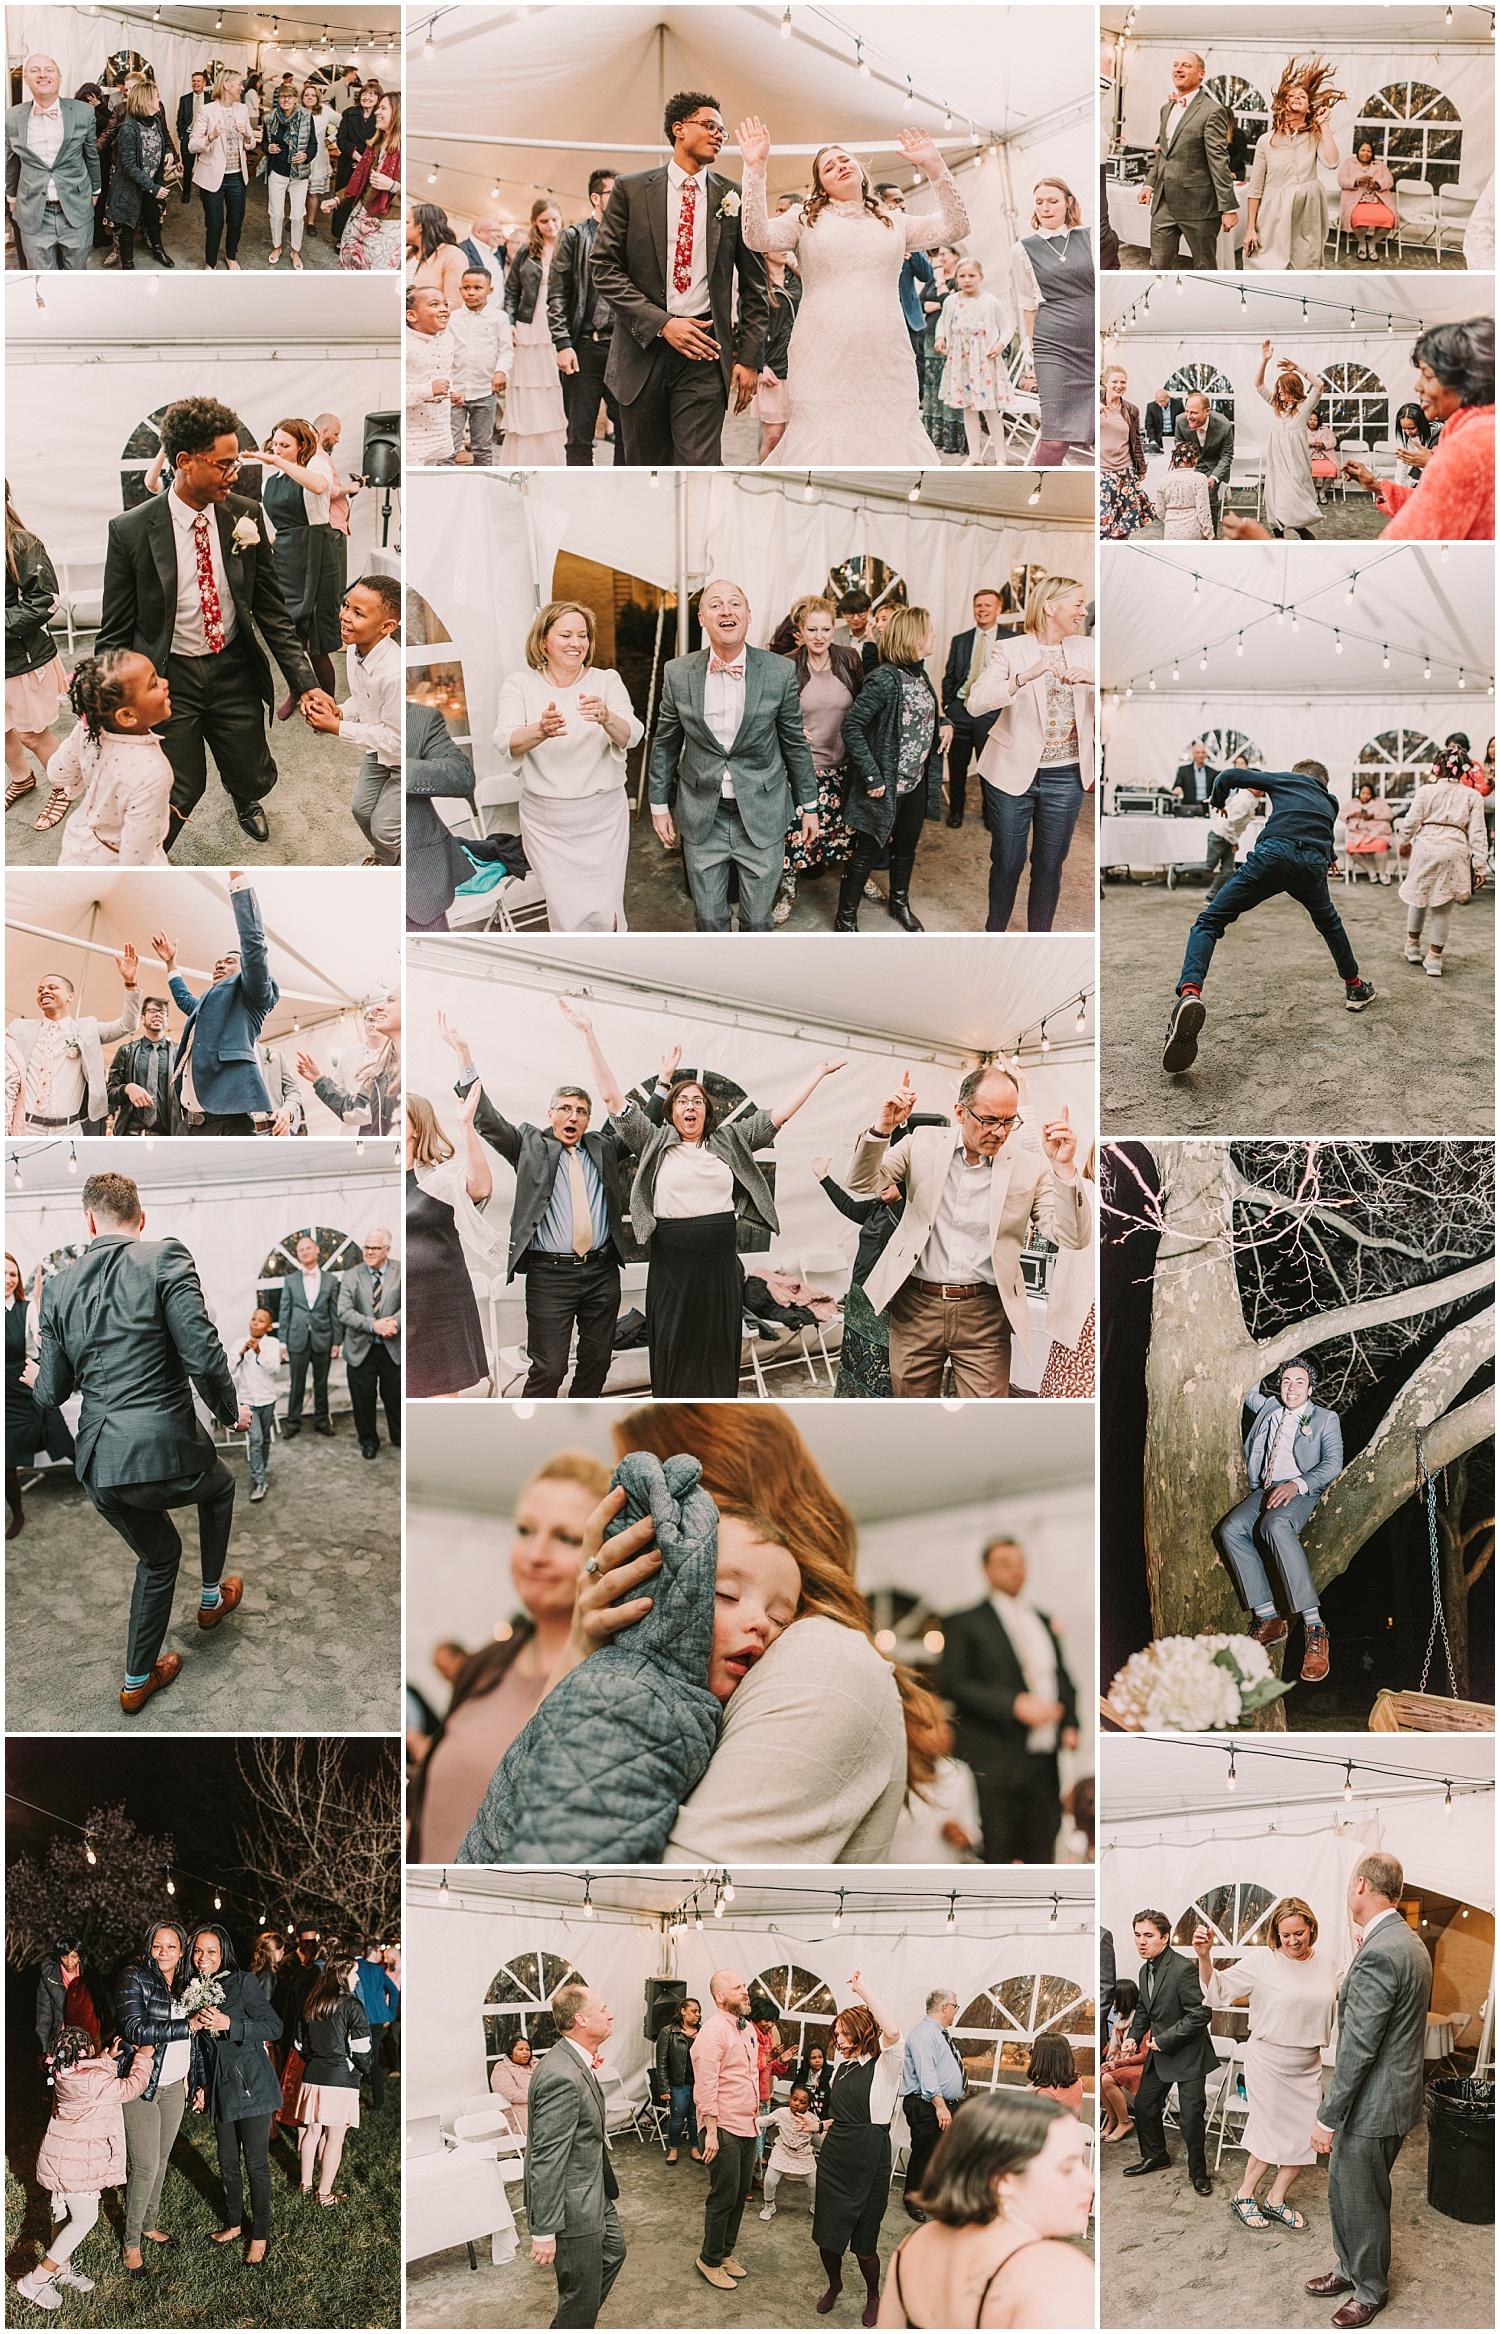 ariannabellephotography-philadelphia LDS wedding (22).jpg